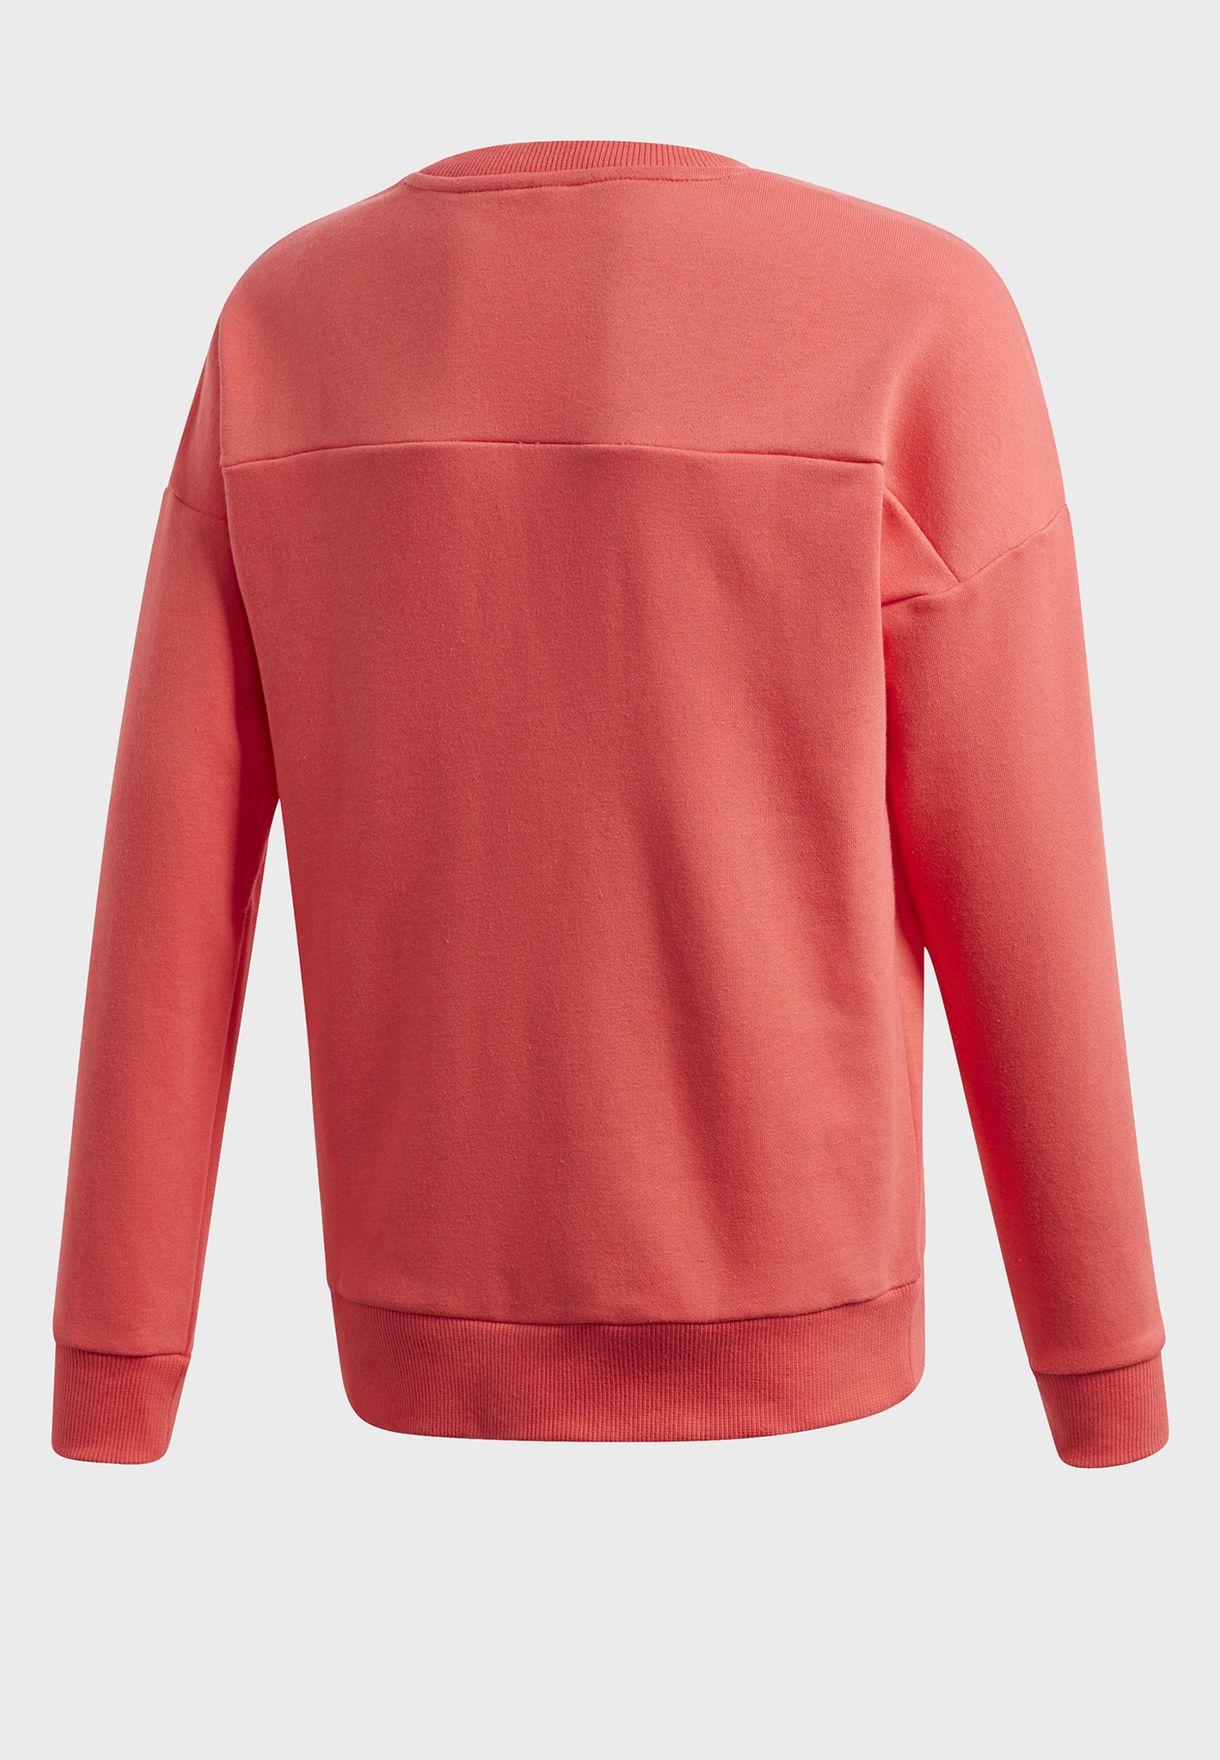 Youth Must Have Sweatshirt